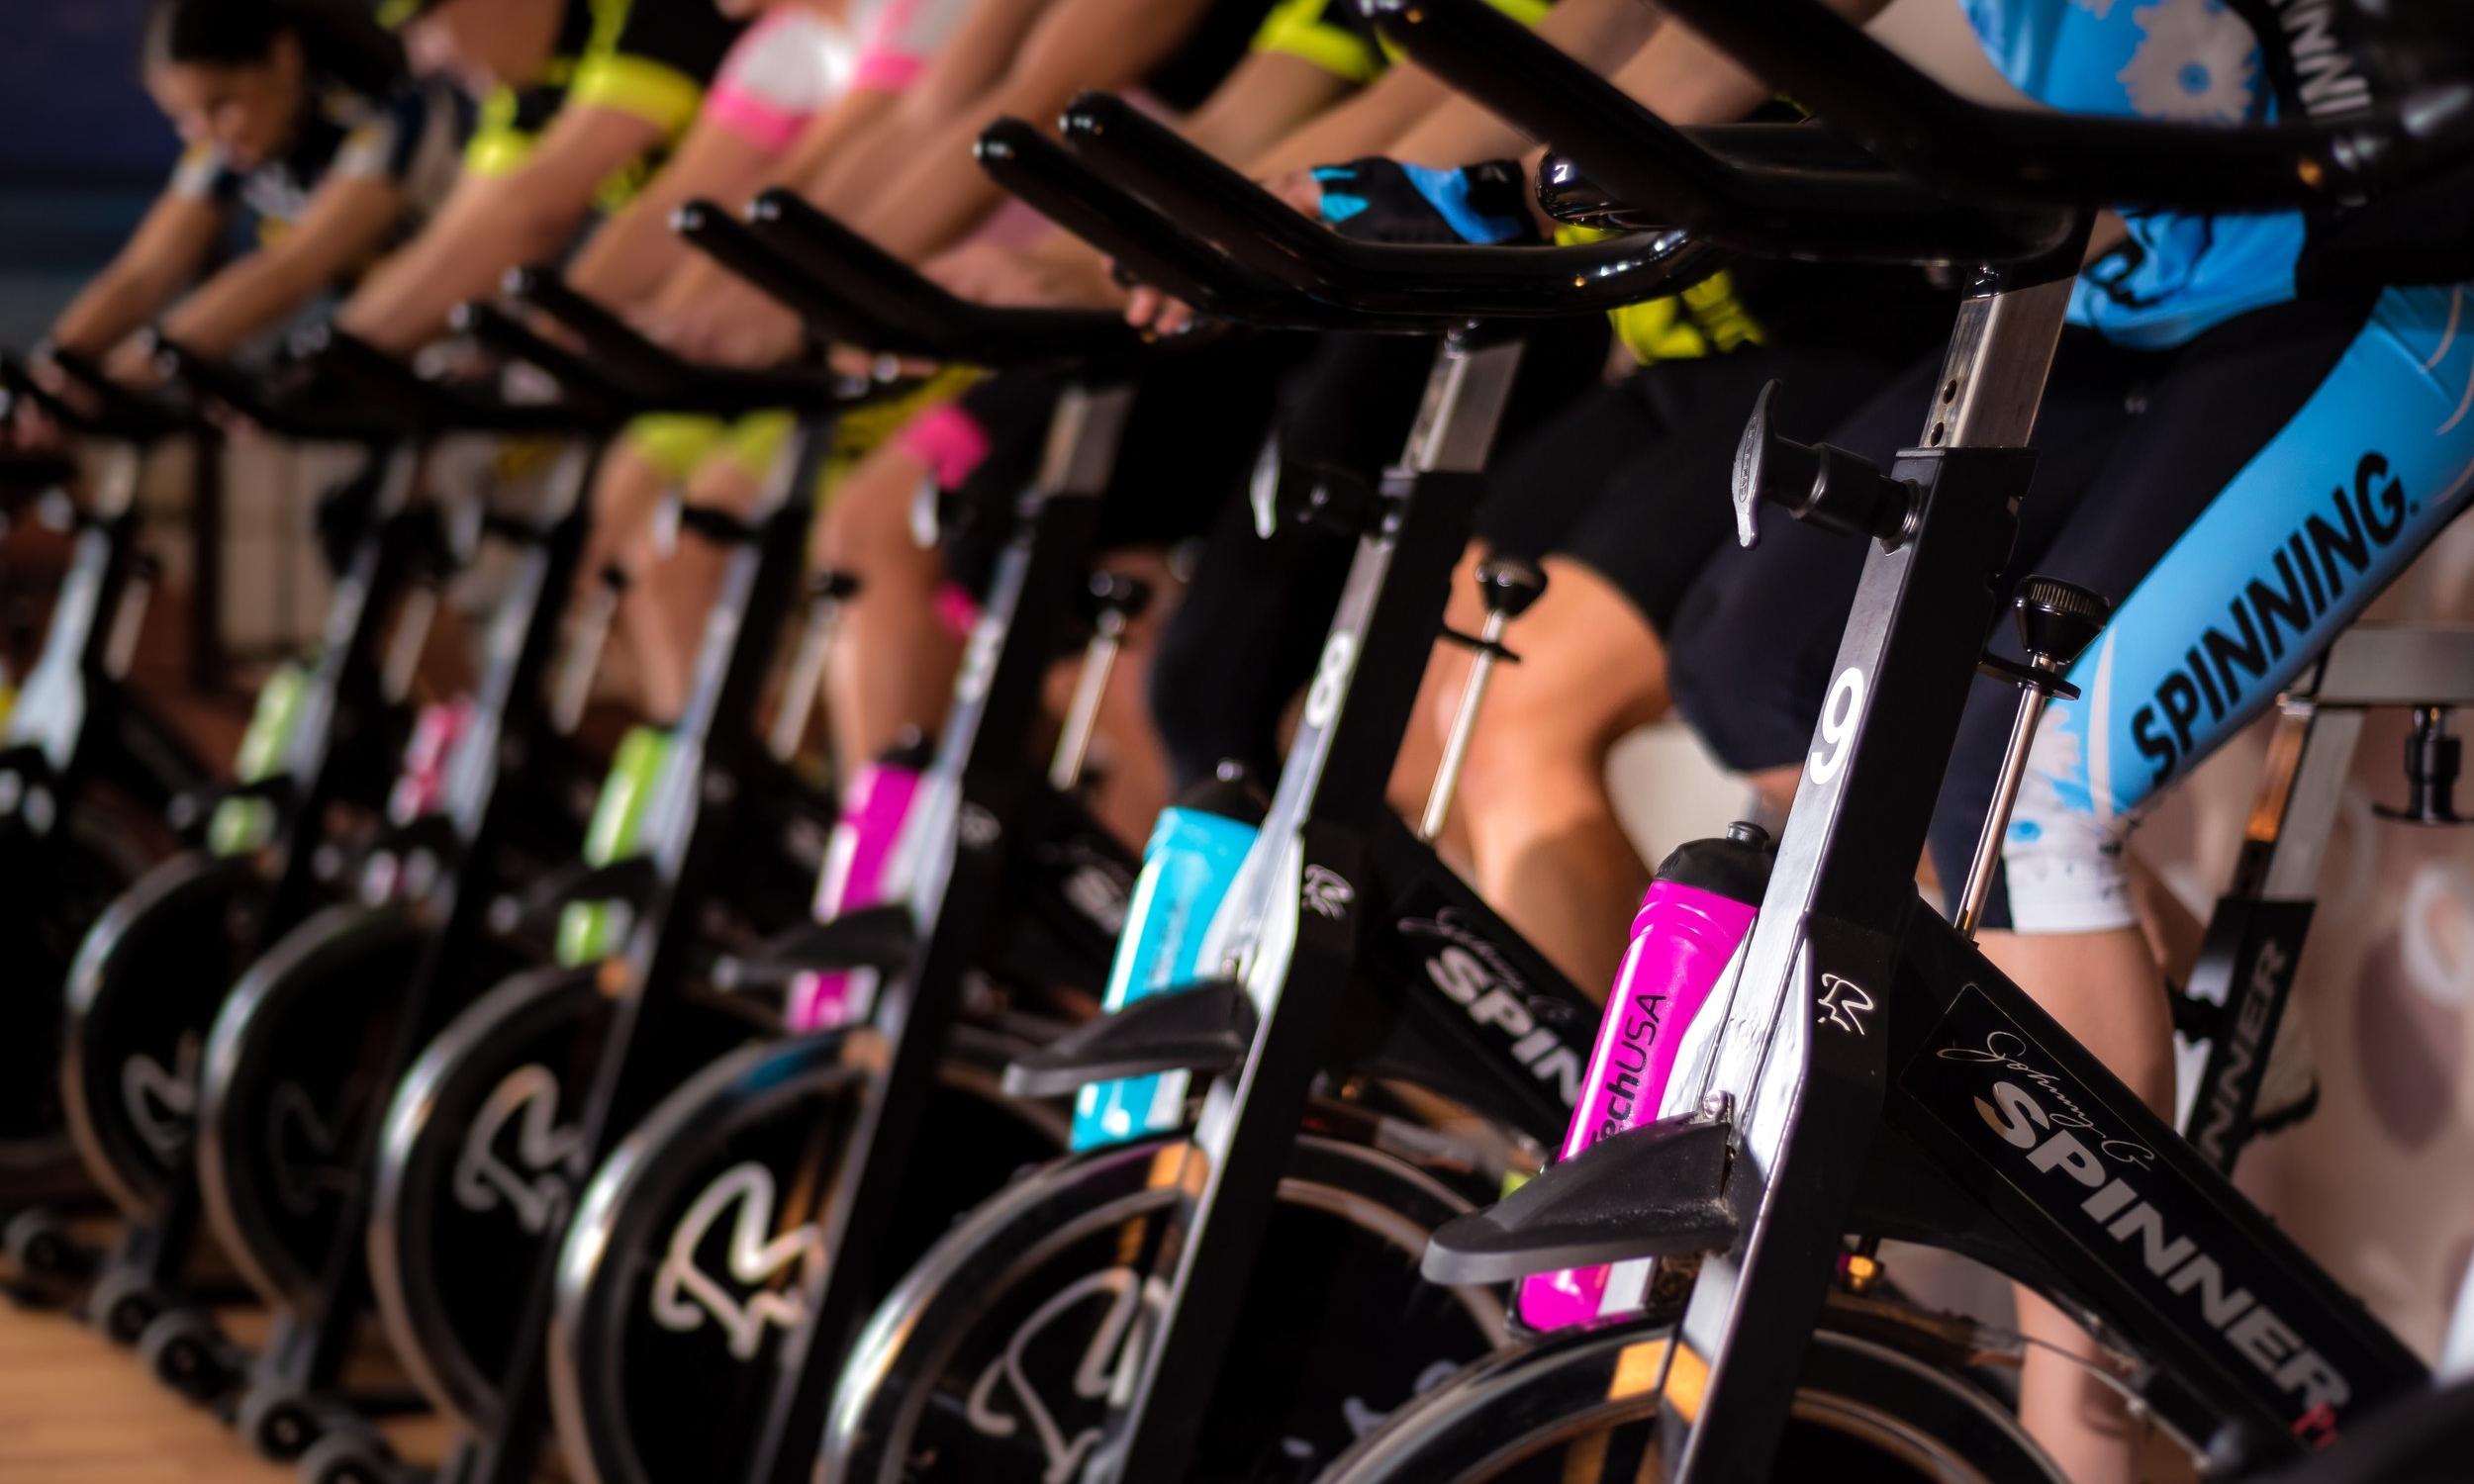 Configure, price, quote - It's sales fitness equipment